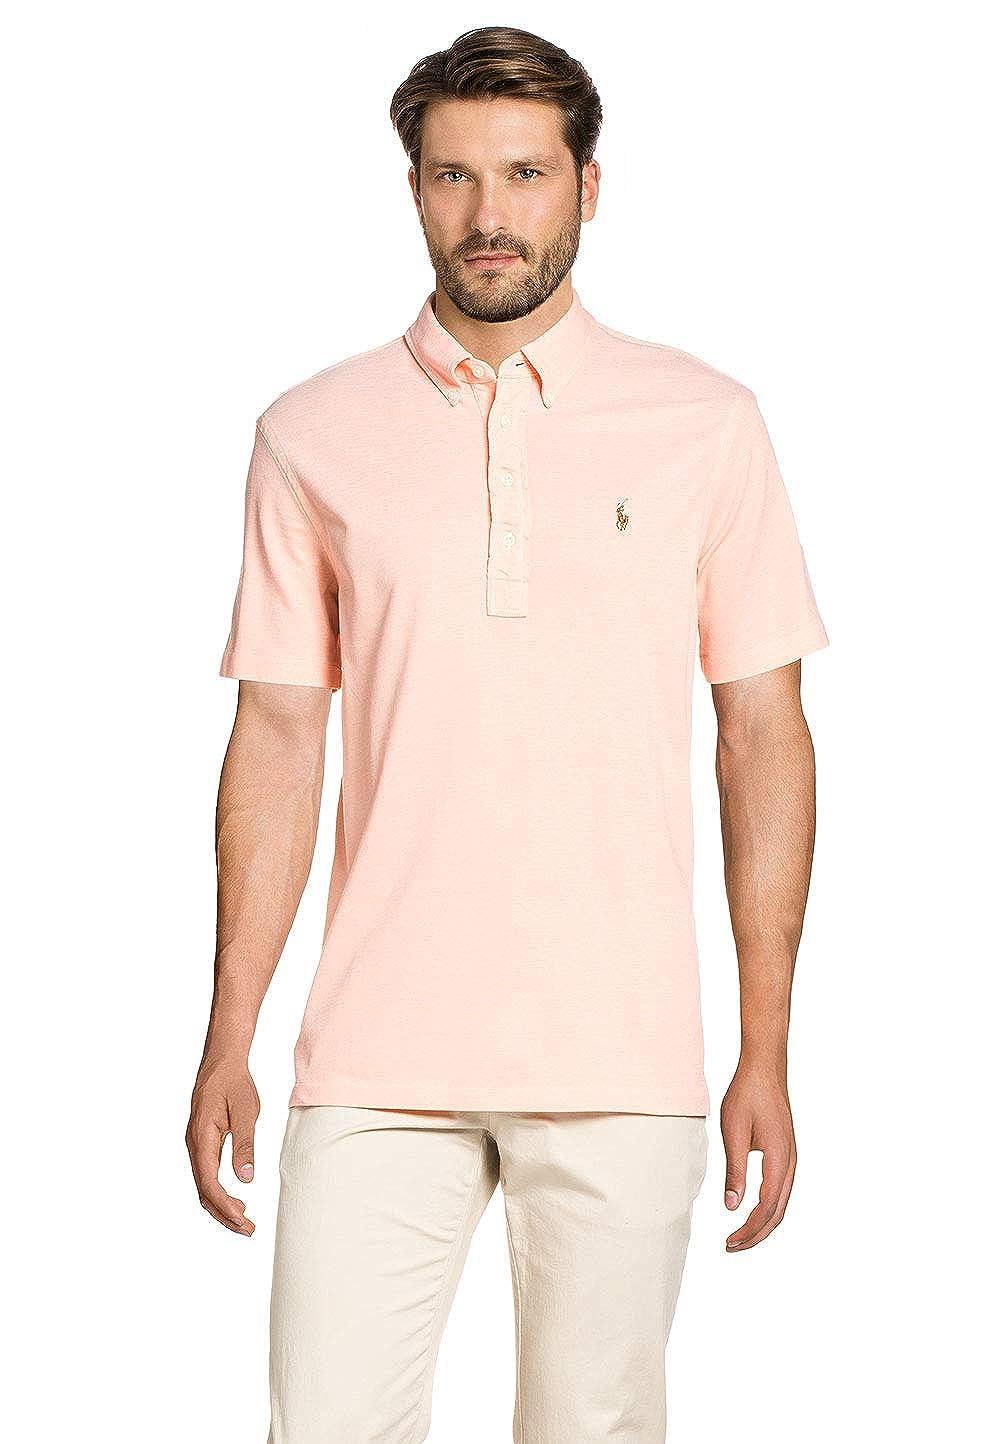 Polo Ralph Lauren Knits Other MenŽs Polo Shirt Melon/White, tamaño ...